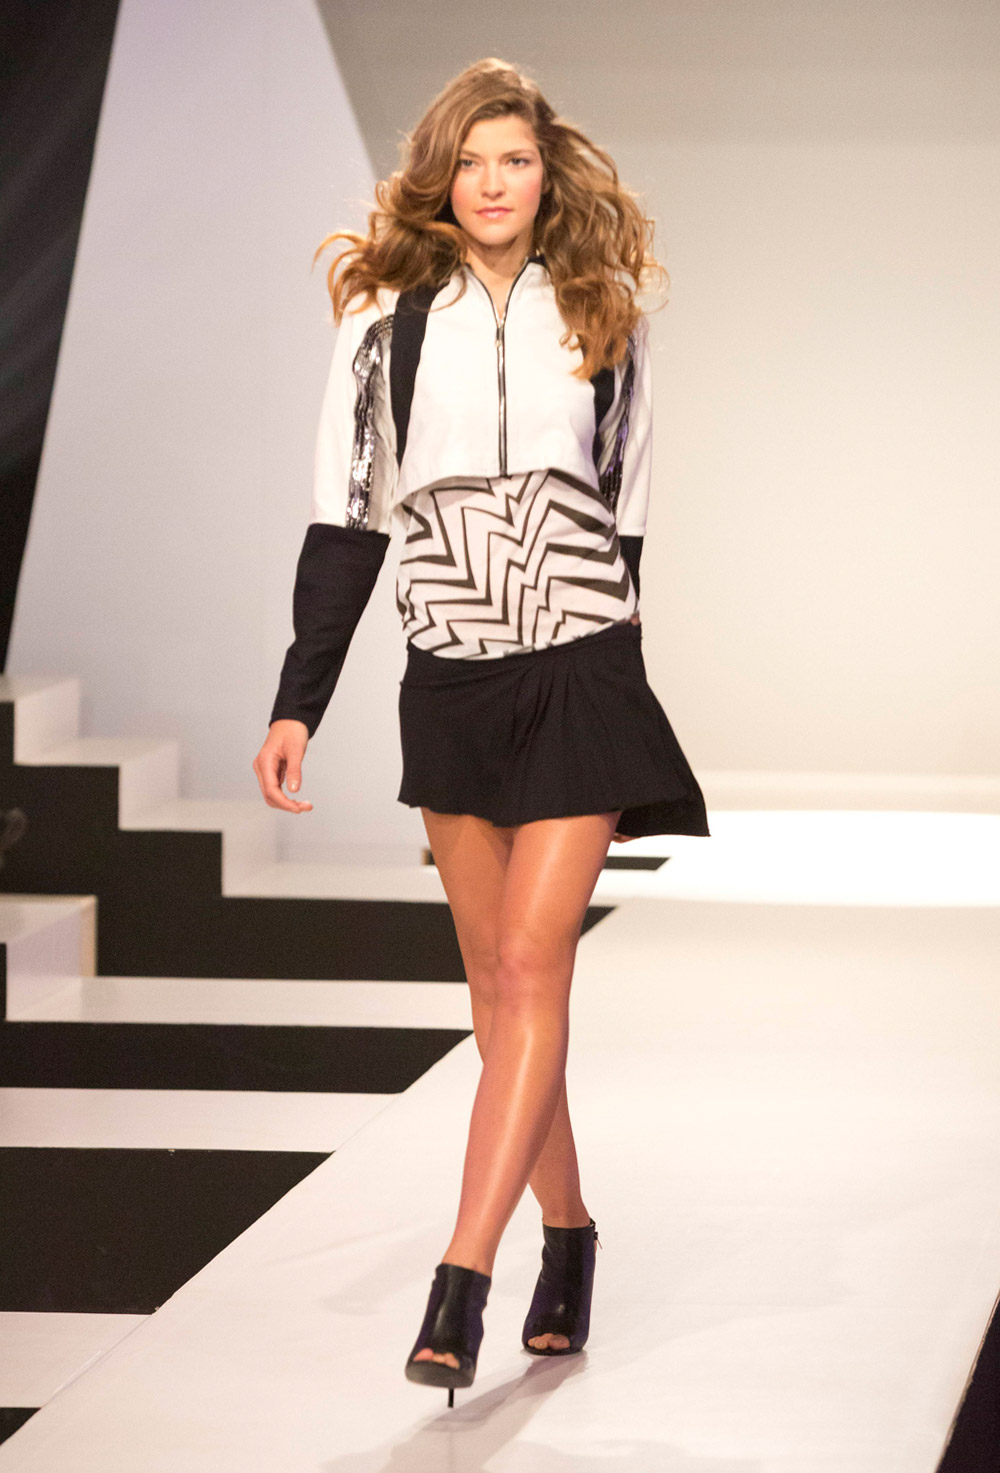 challenge: Zendaya concert outfit